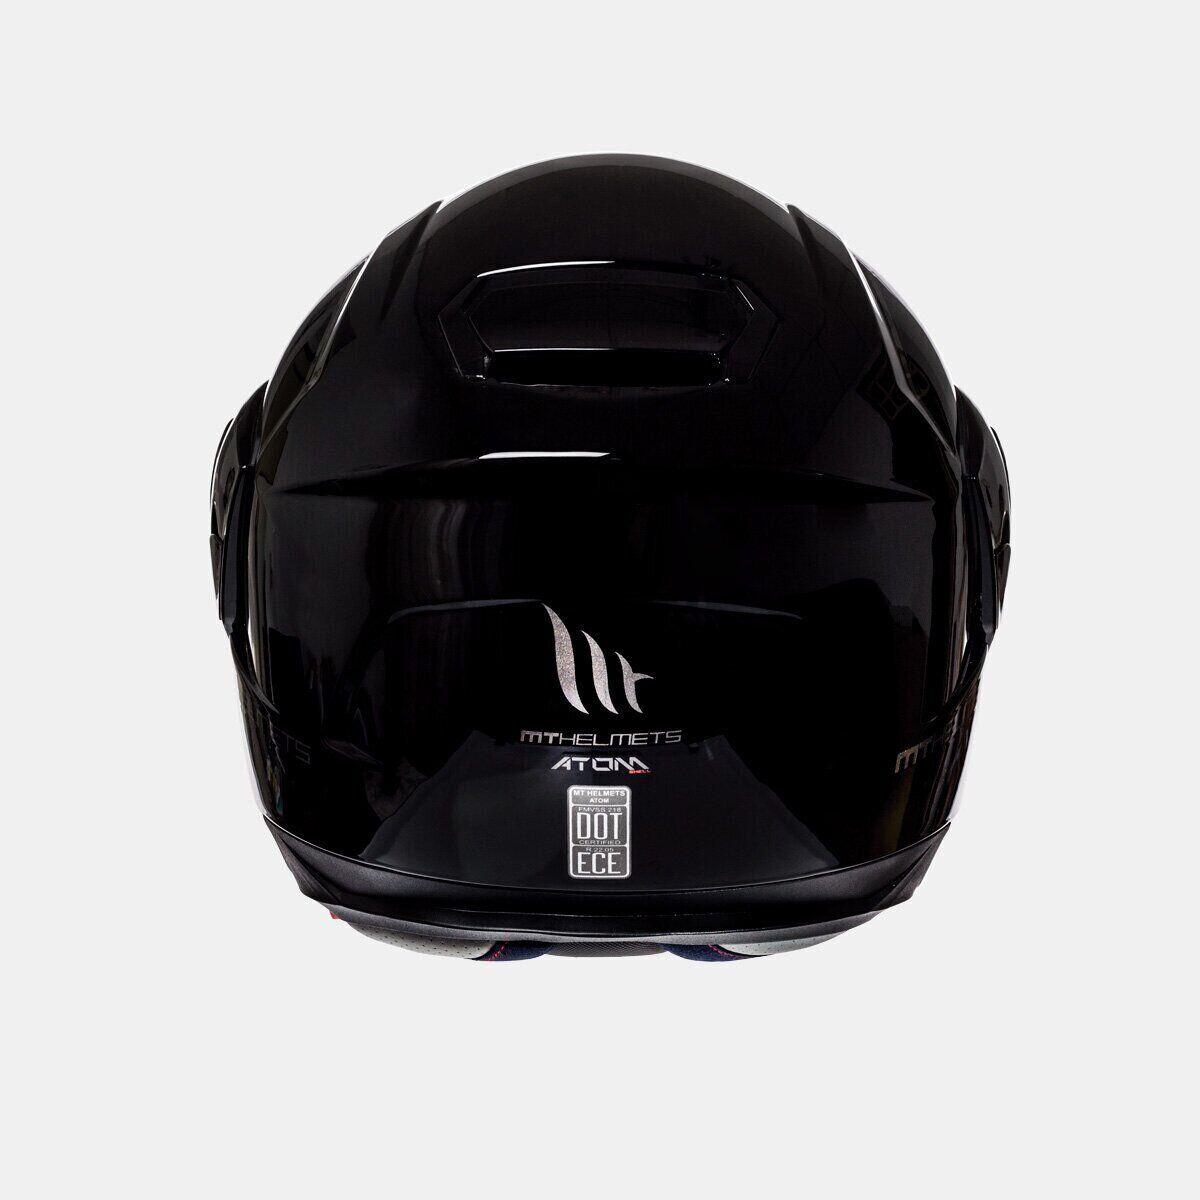 Мотошлем MT ATOM SV SOLID GLOSS BLACK  Артмото - купить квадроцикл в украине и харькове, мотоцикл, снегоход, скутер, мопед, электромобиль